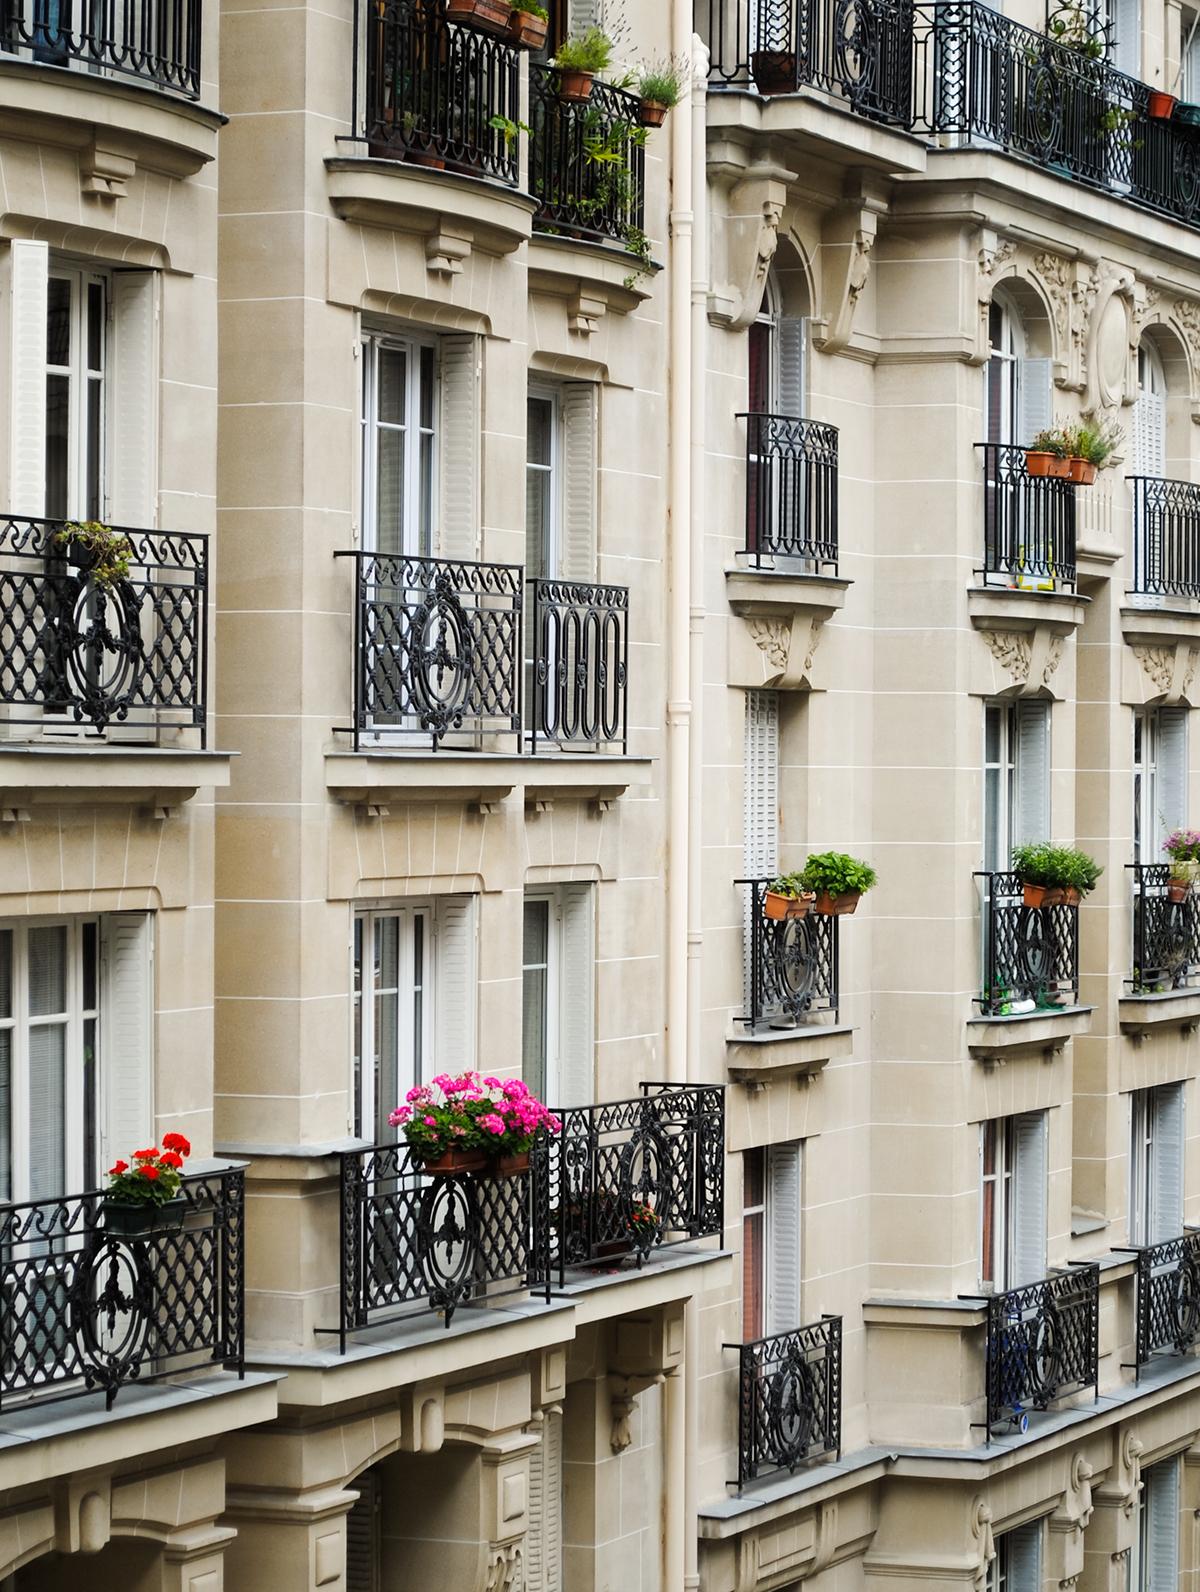 Facade%2C_Montnarte_Paris